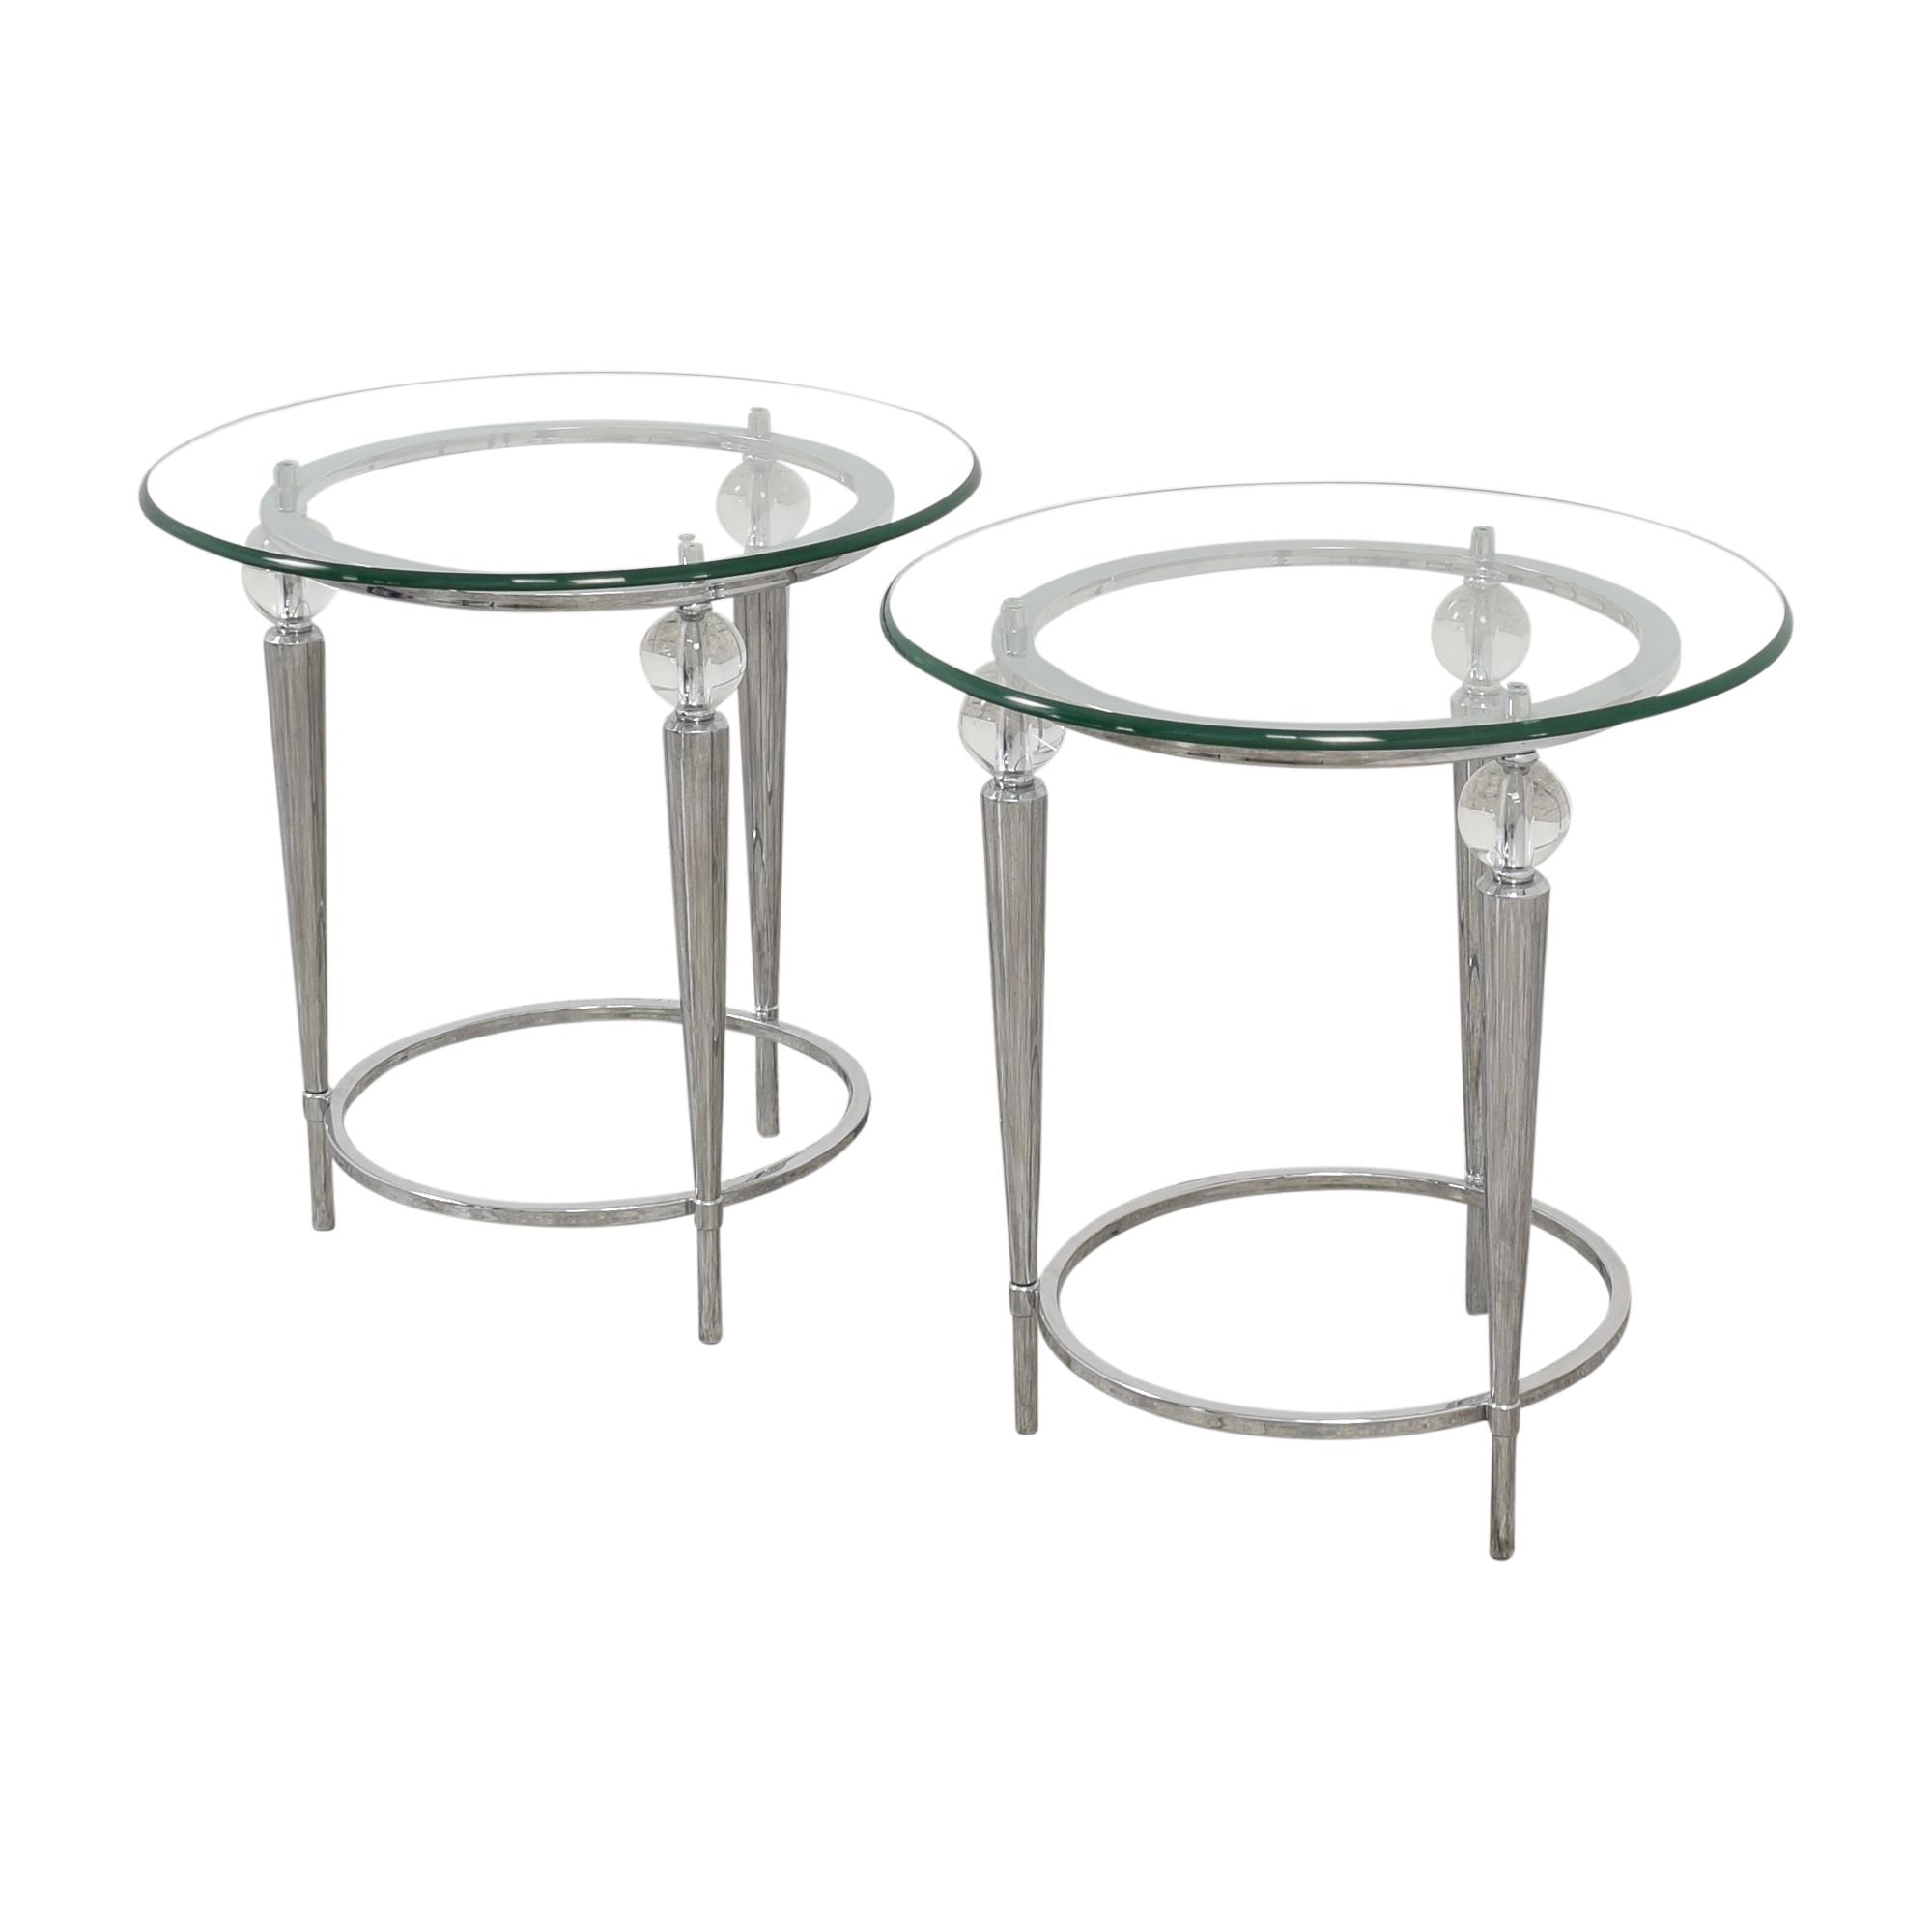 AllModern AllModern Round Glass Top Side Tables on sale